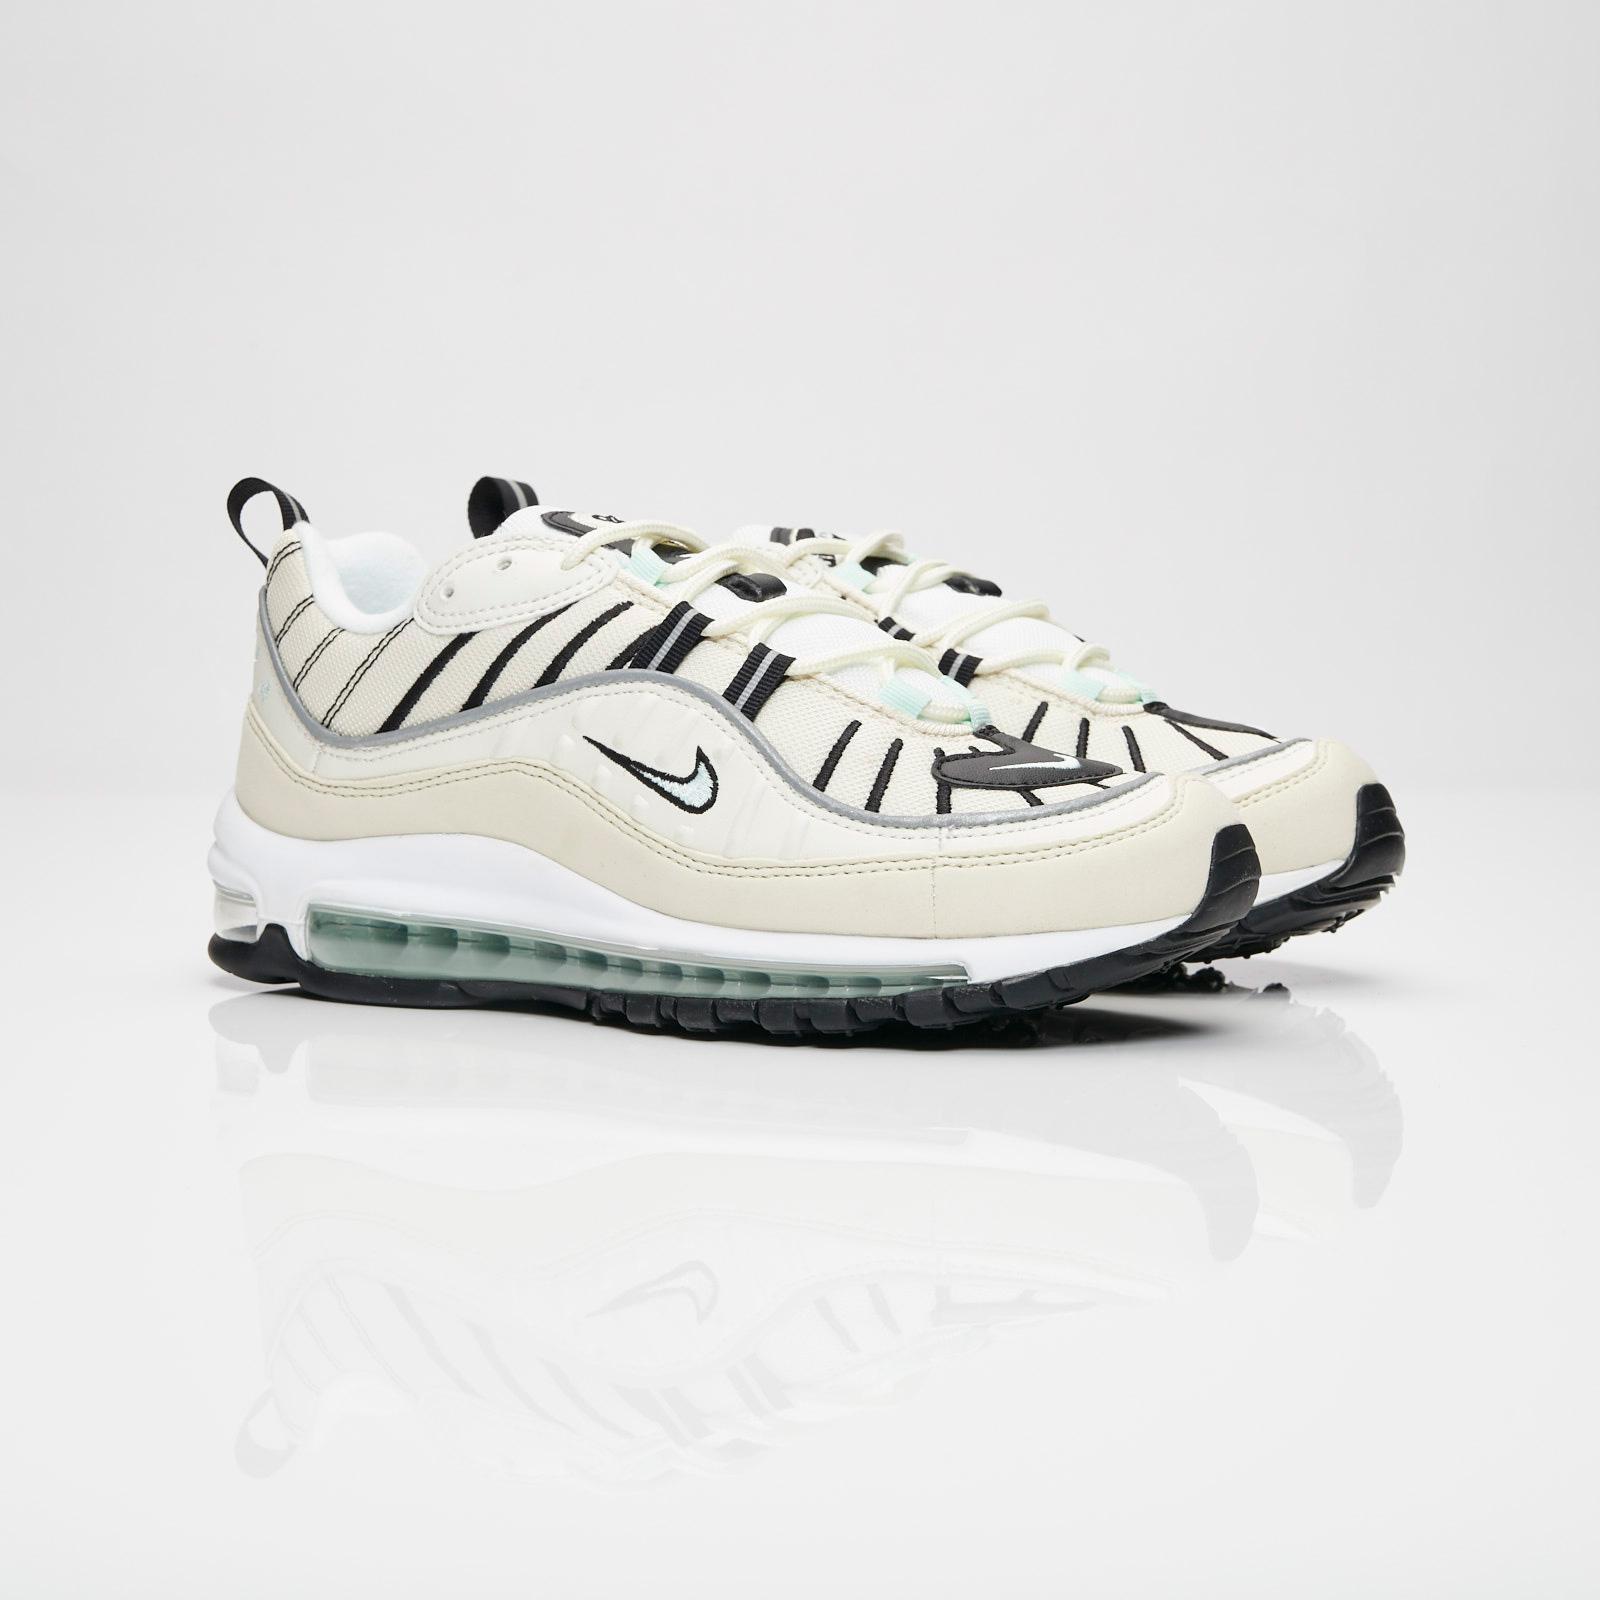 new product 99110 f08e4 Nike Sportswear Wmns Air Max 98